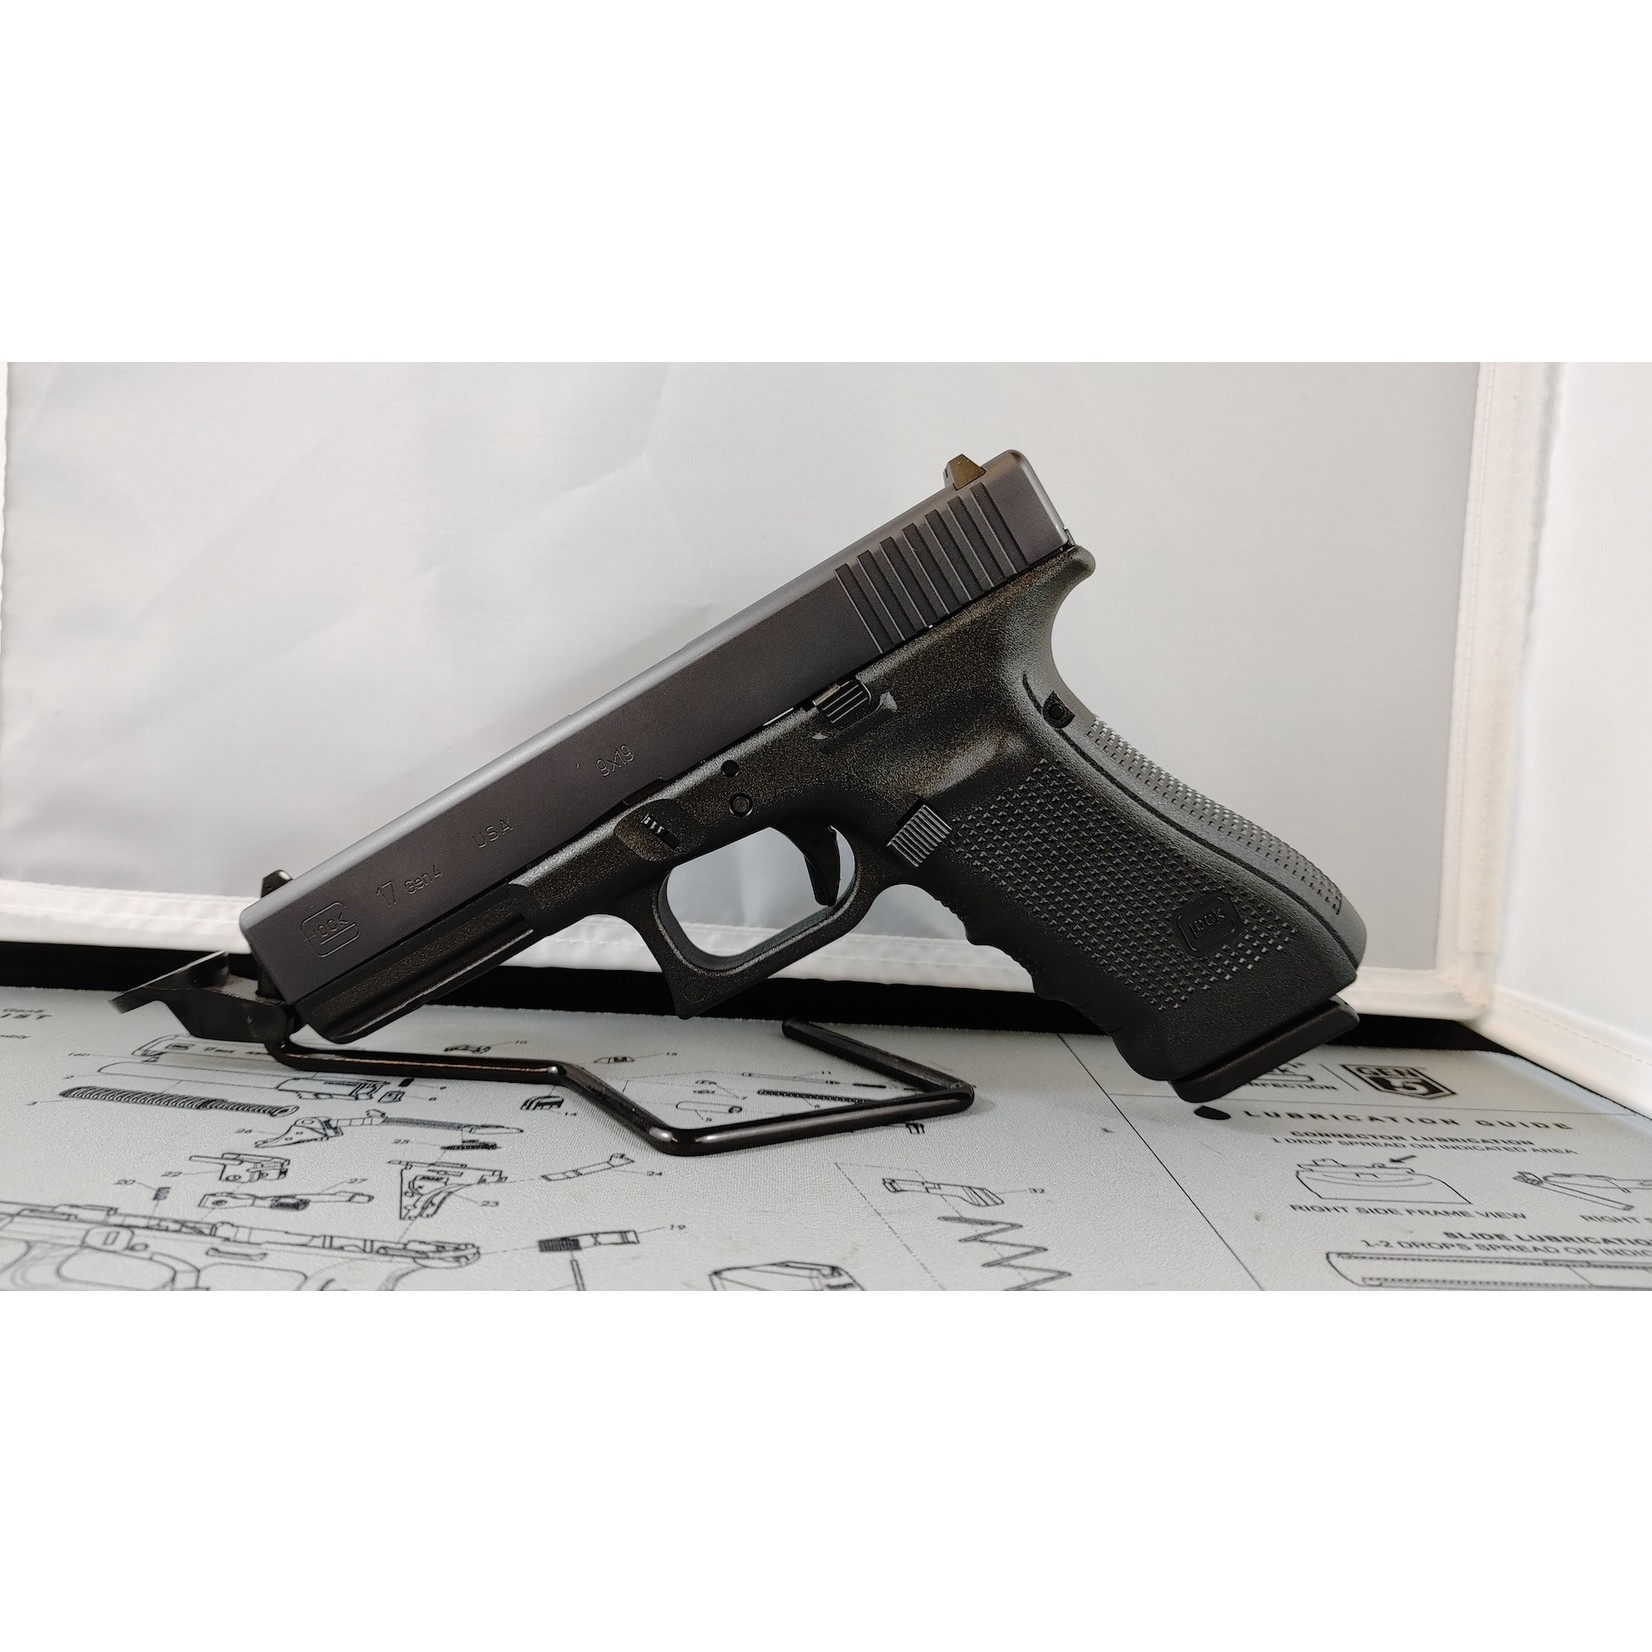 Glock Glock 17 Gen4 9mm Fixed Sights